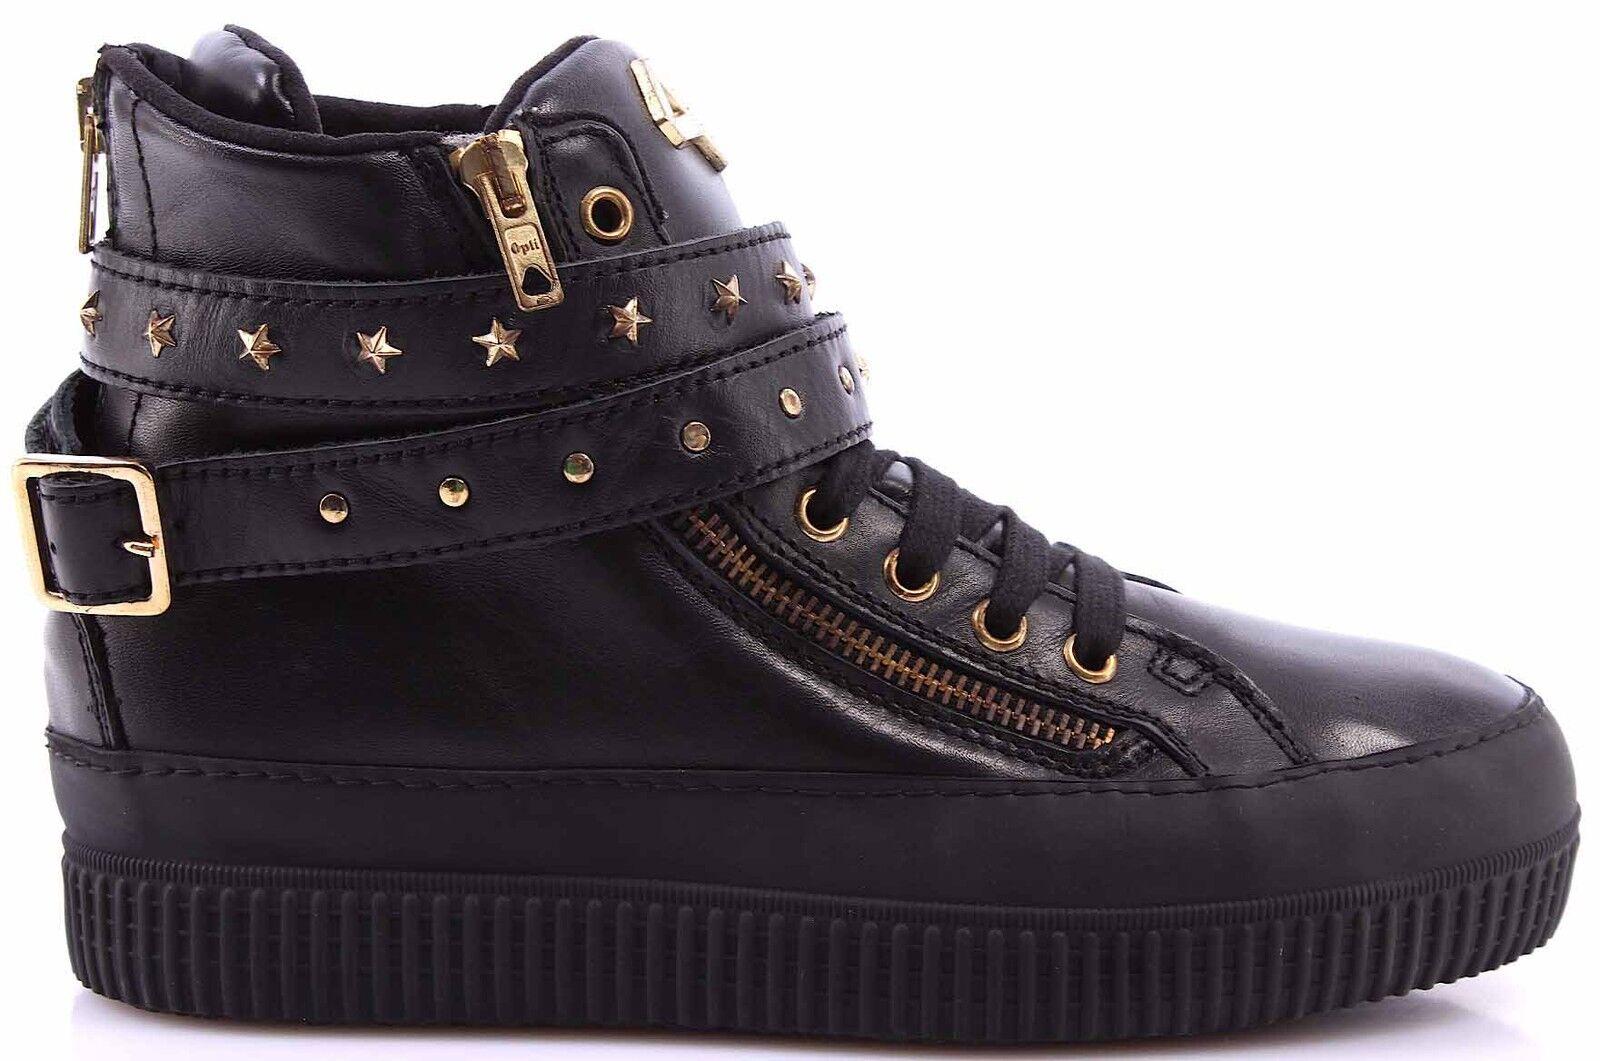 chaussures chaussures chaussures baskets Alte femmes CYCLE 371146 SP1 Sport noir Pelle Made In  dcea2a